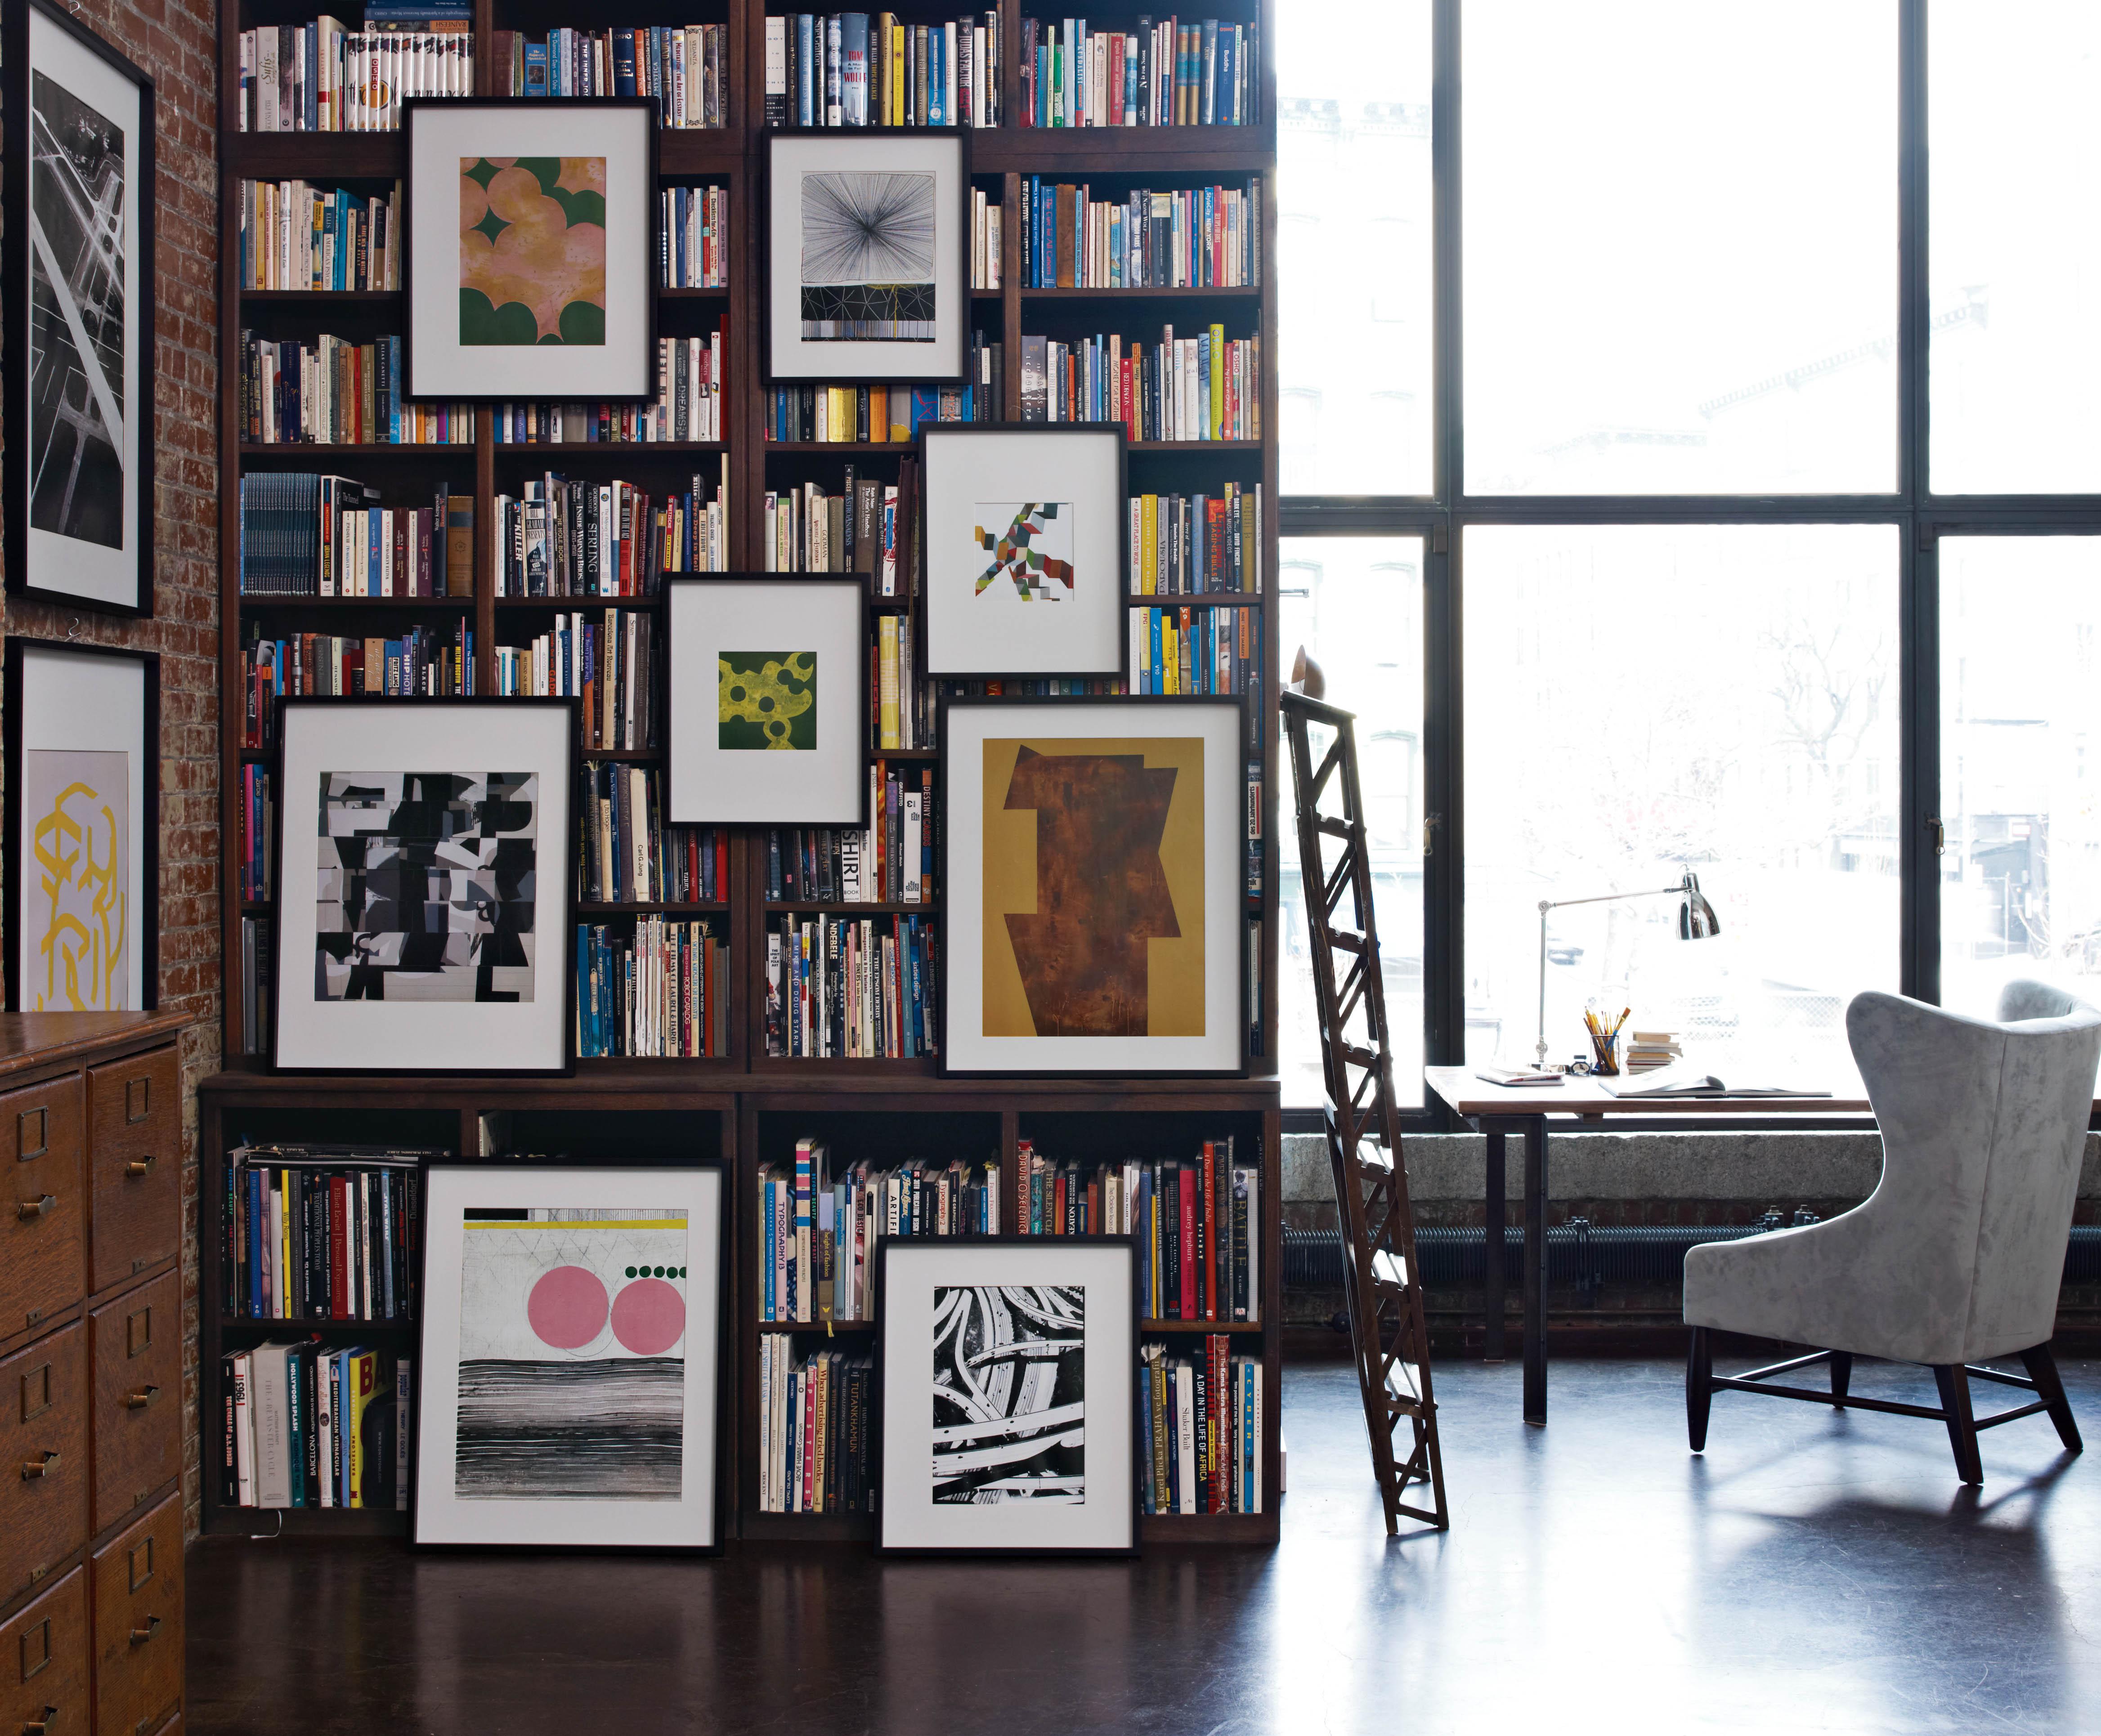 Furniture Stores Like West Elm #34: Hanging Art On Bookshelves